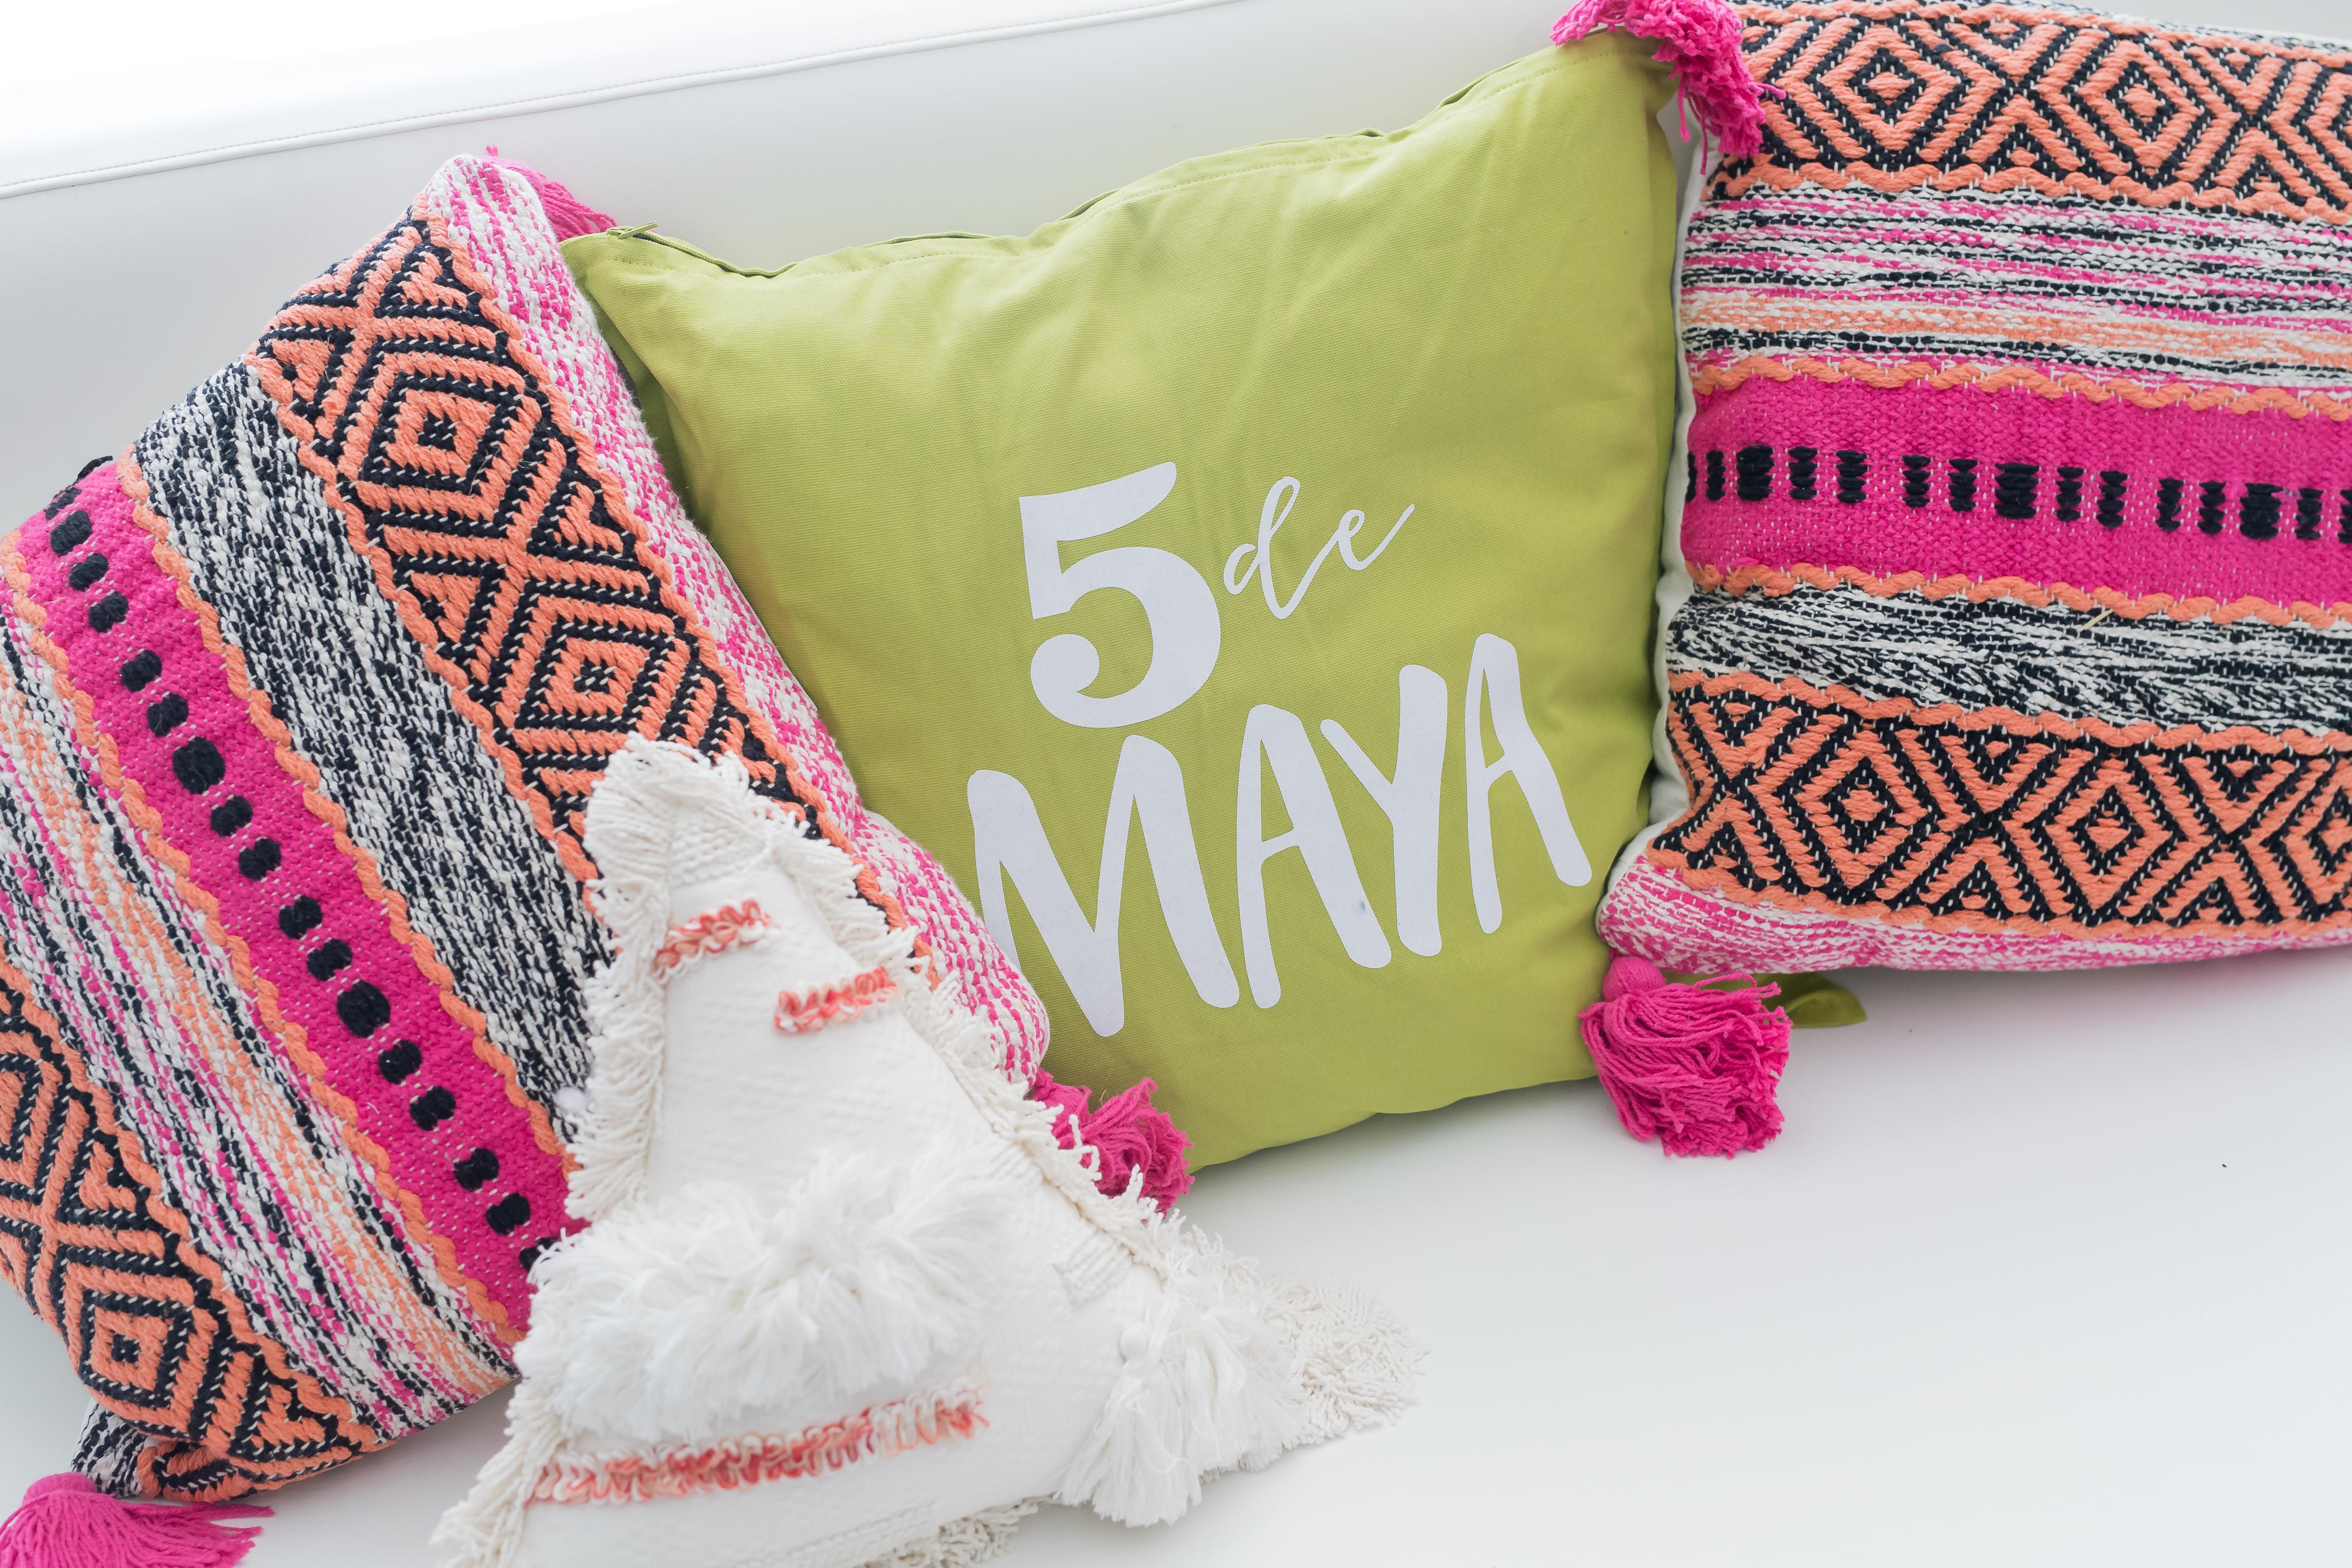 5 de Maya - One Inspired Party